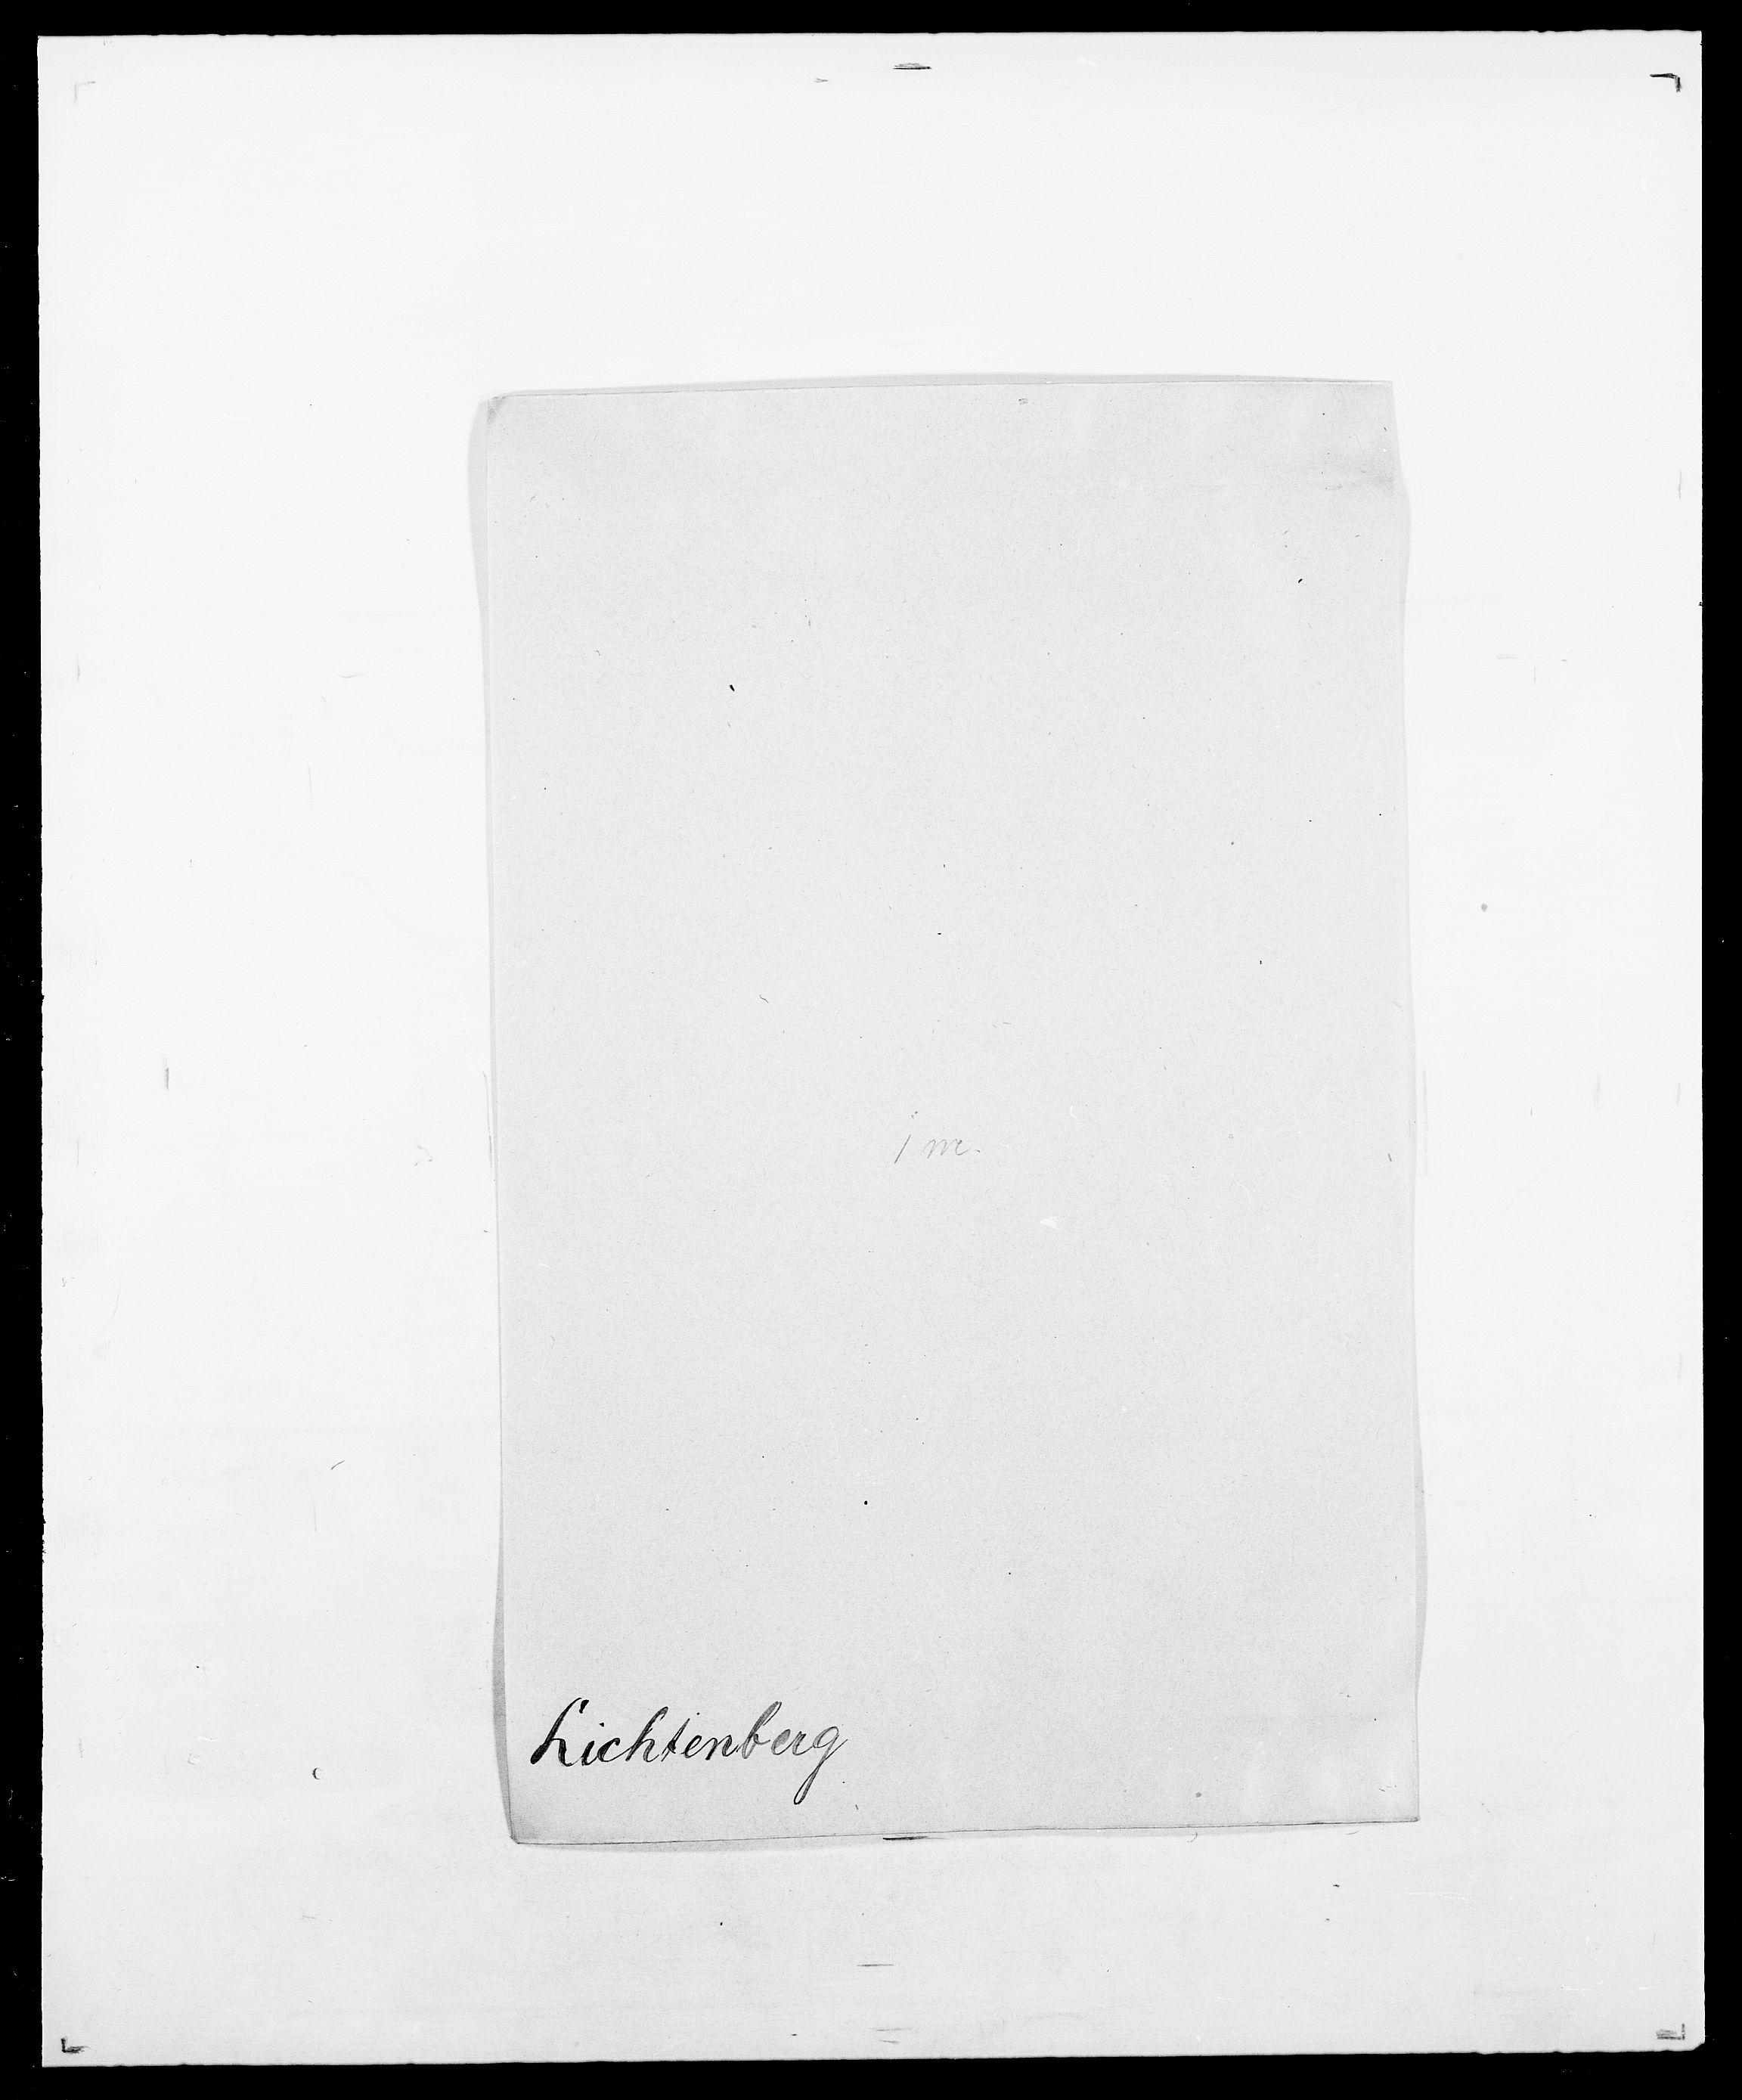 SAO, Delgobe, Charles Antoine - samling, D/Da/L0023: Lau - Lirvyn, s. 318